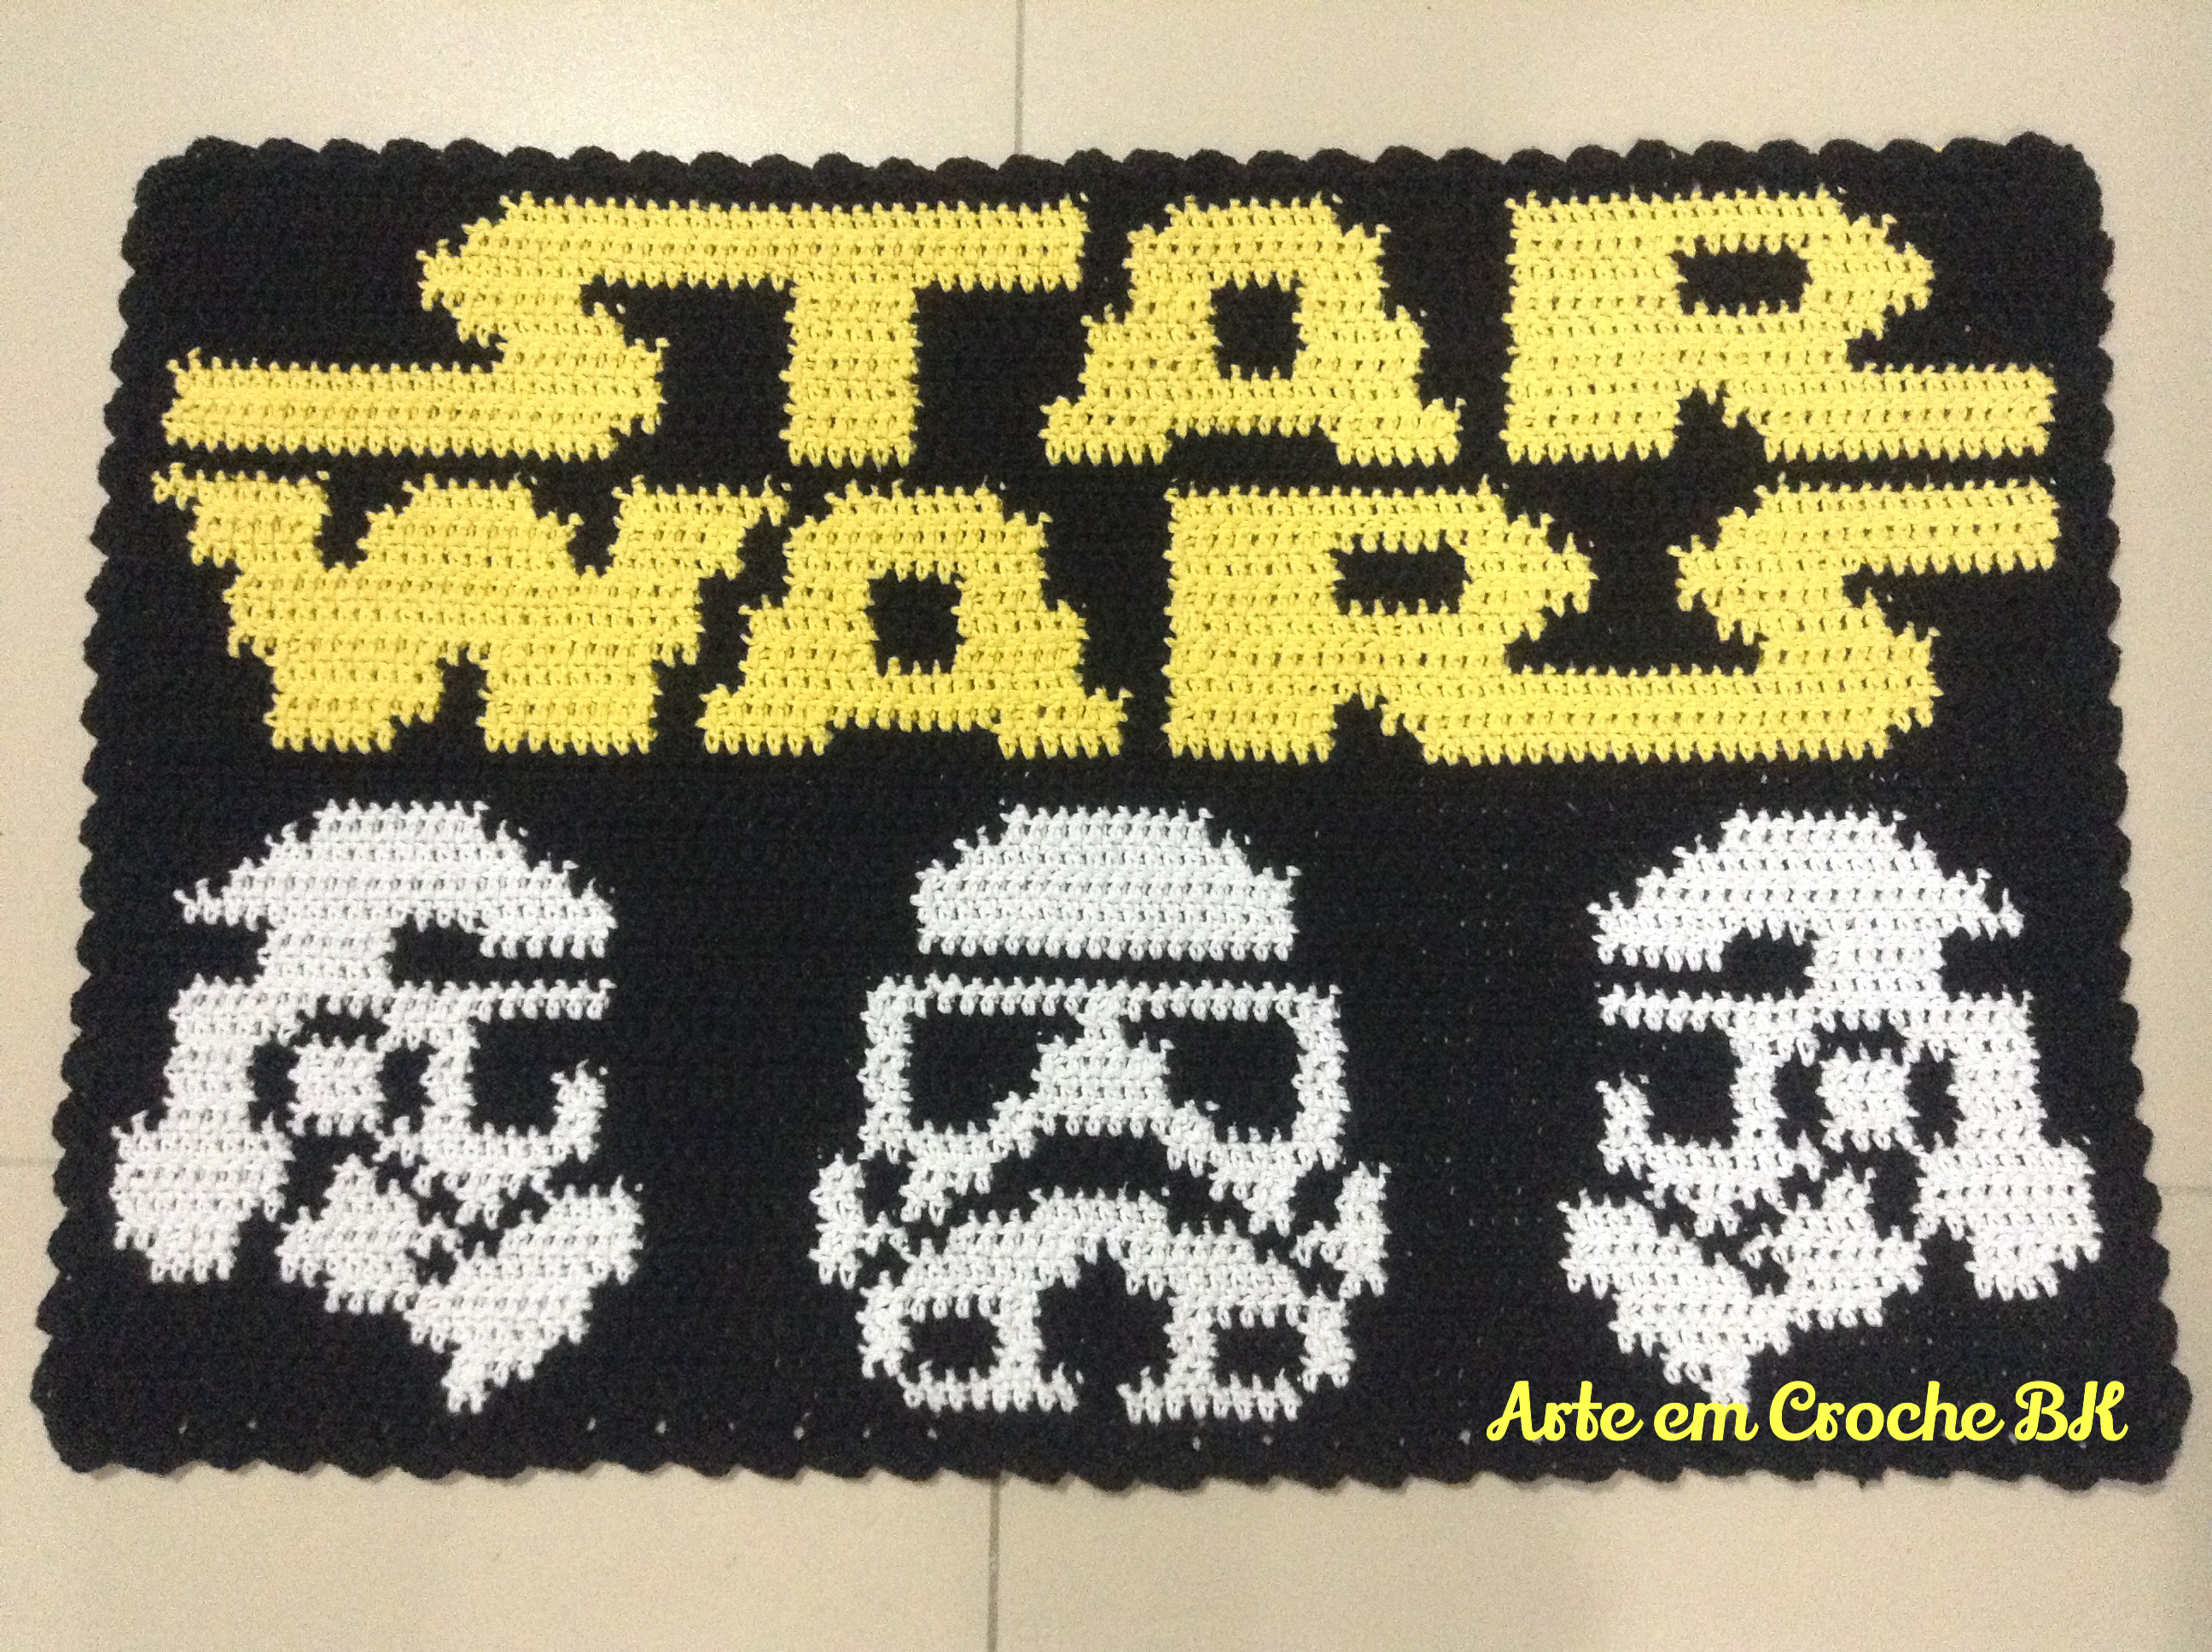 tapete croche star wars arte em croche bk elo7. Black Bedroom Furniture Sets. Home Design Ideas